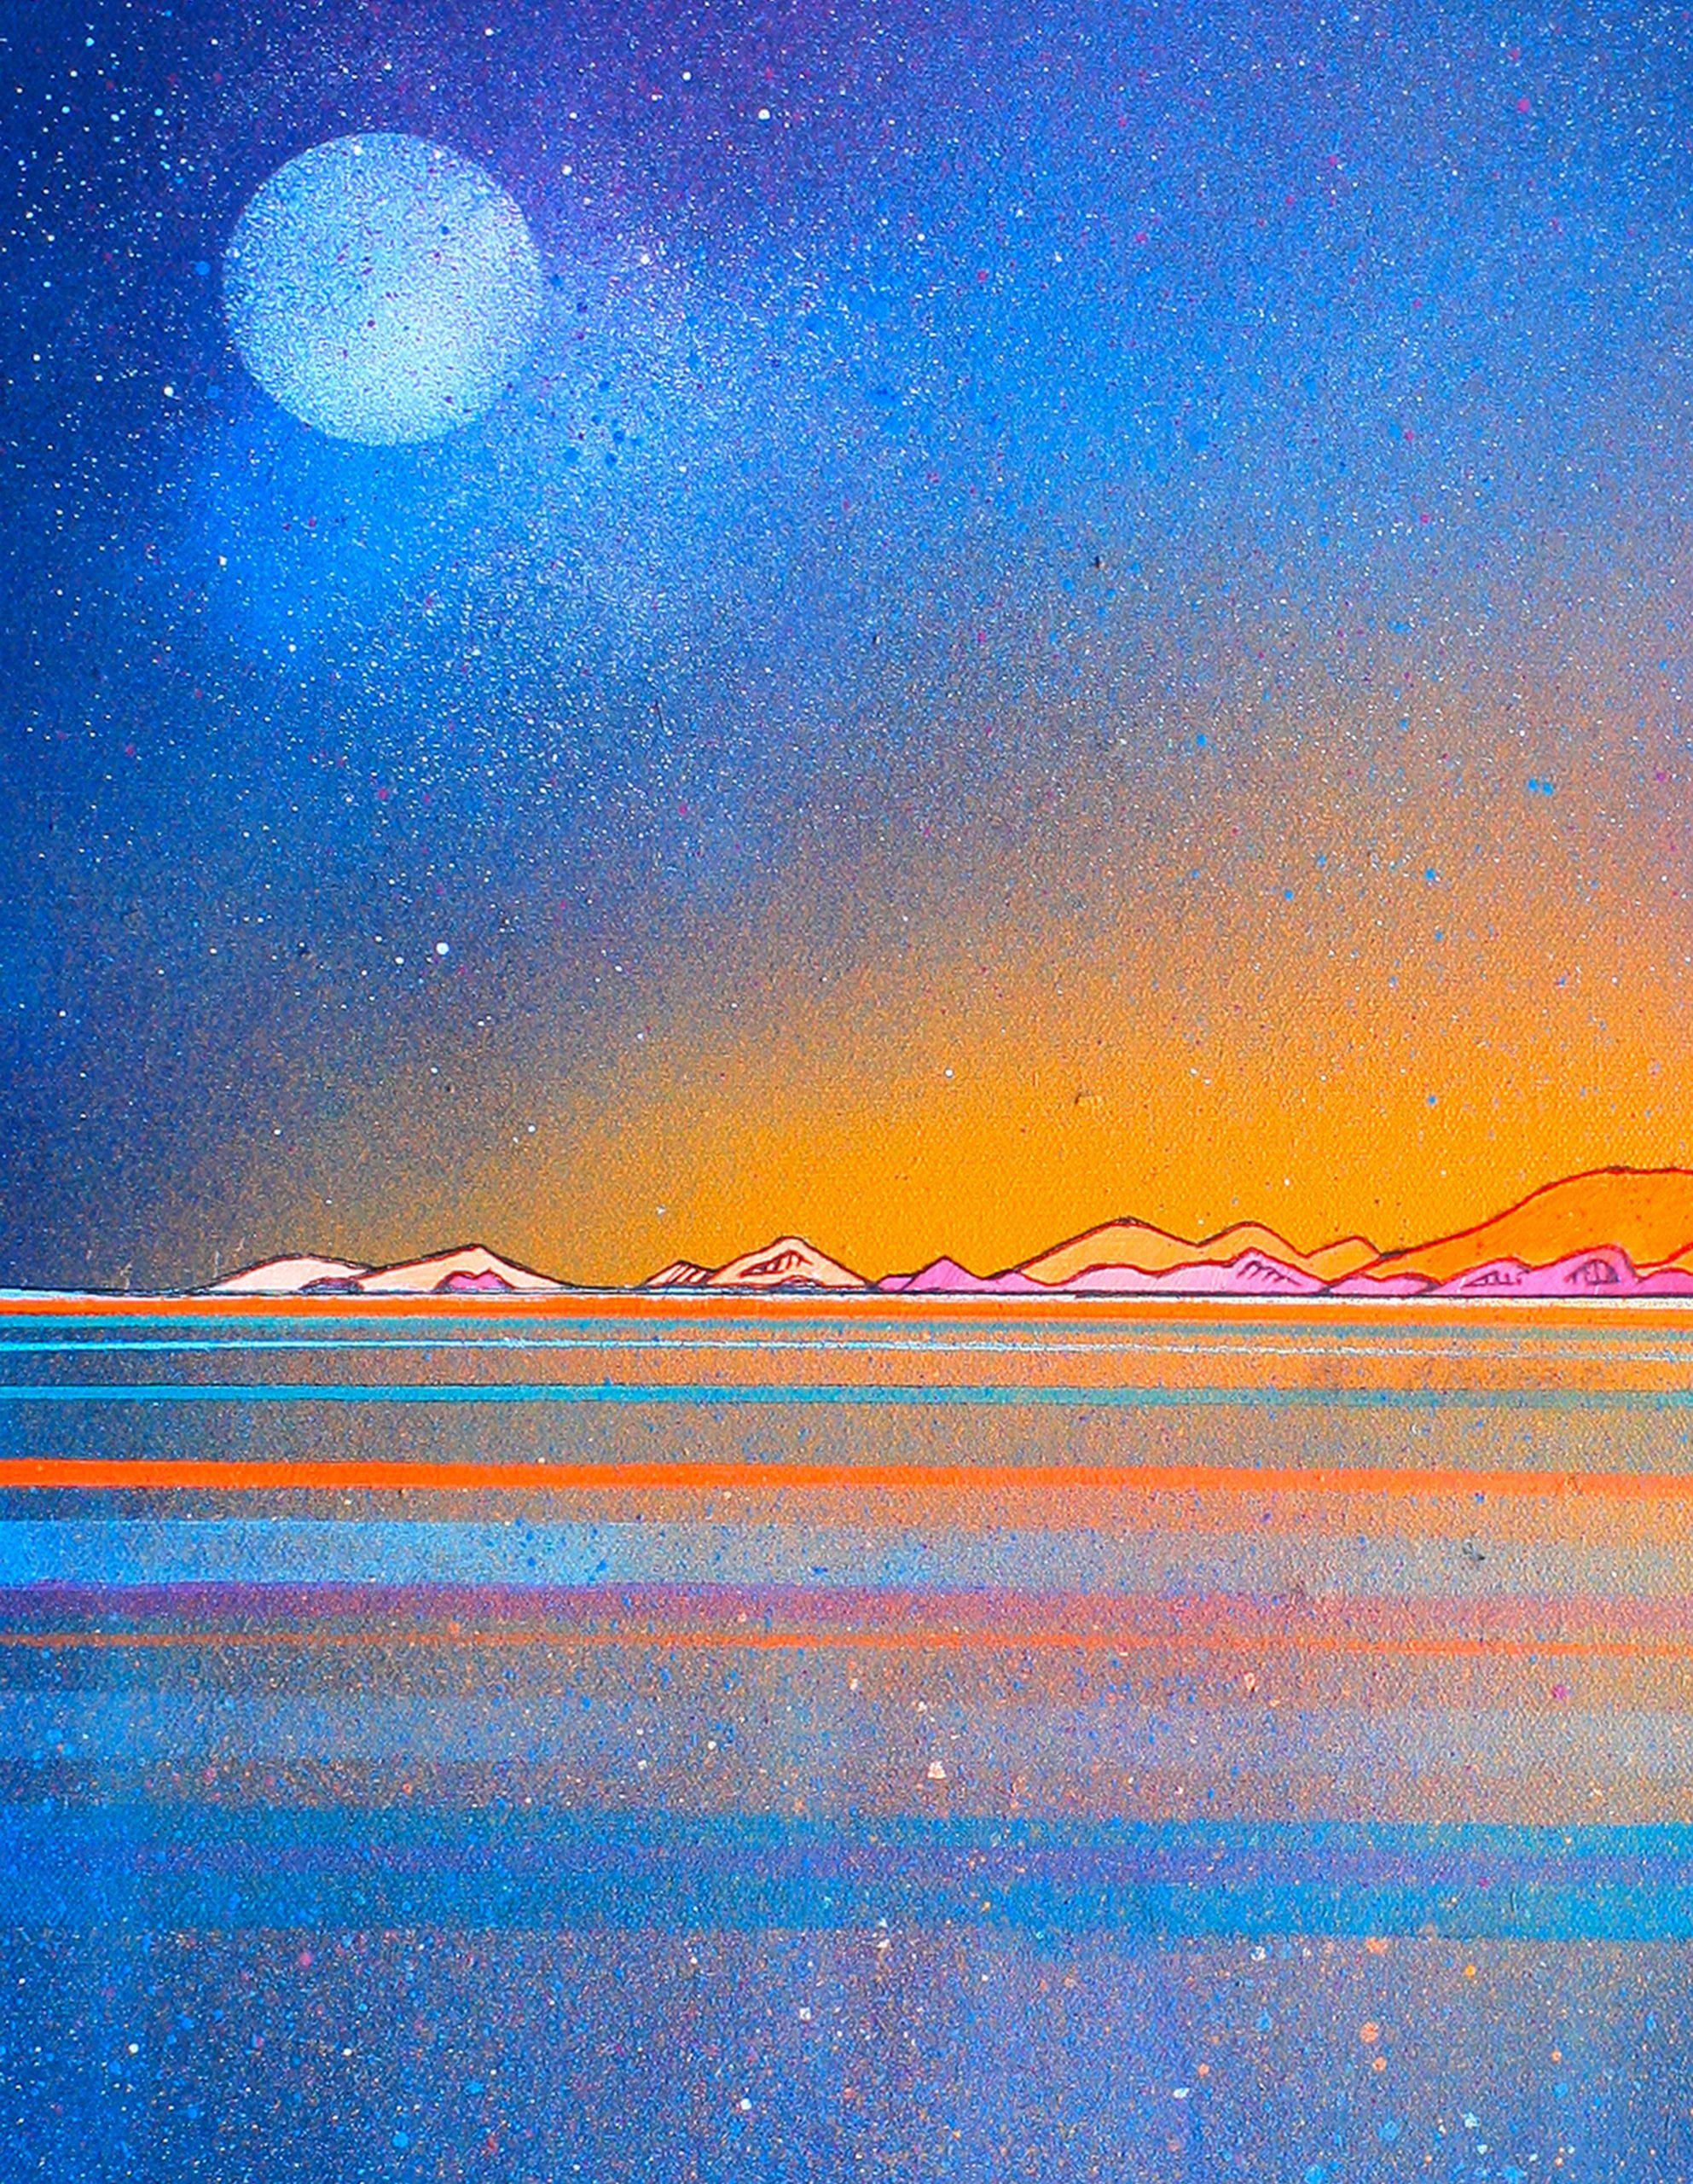 Coral Beach, Skye, Scottish Hebrides - Original canvas painting detail & art prints - 2